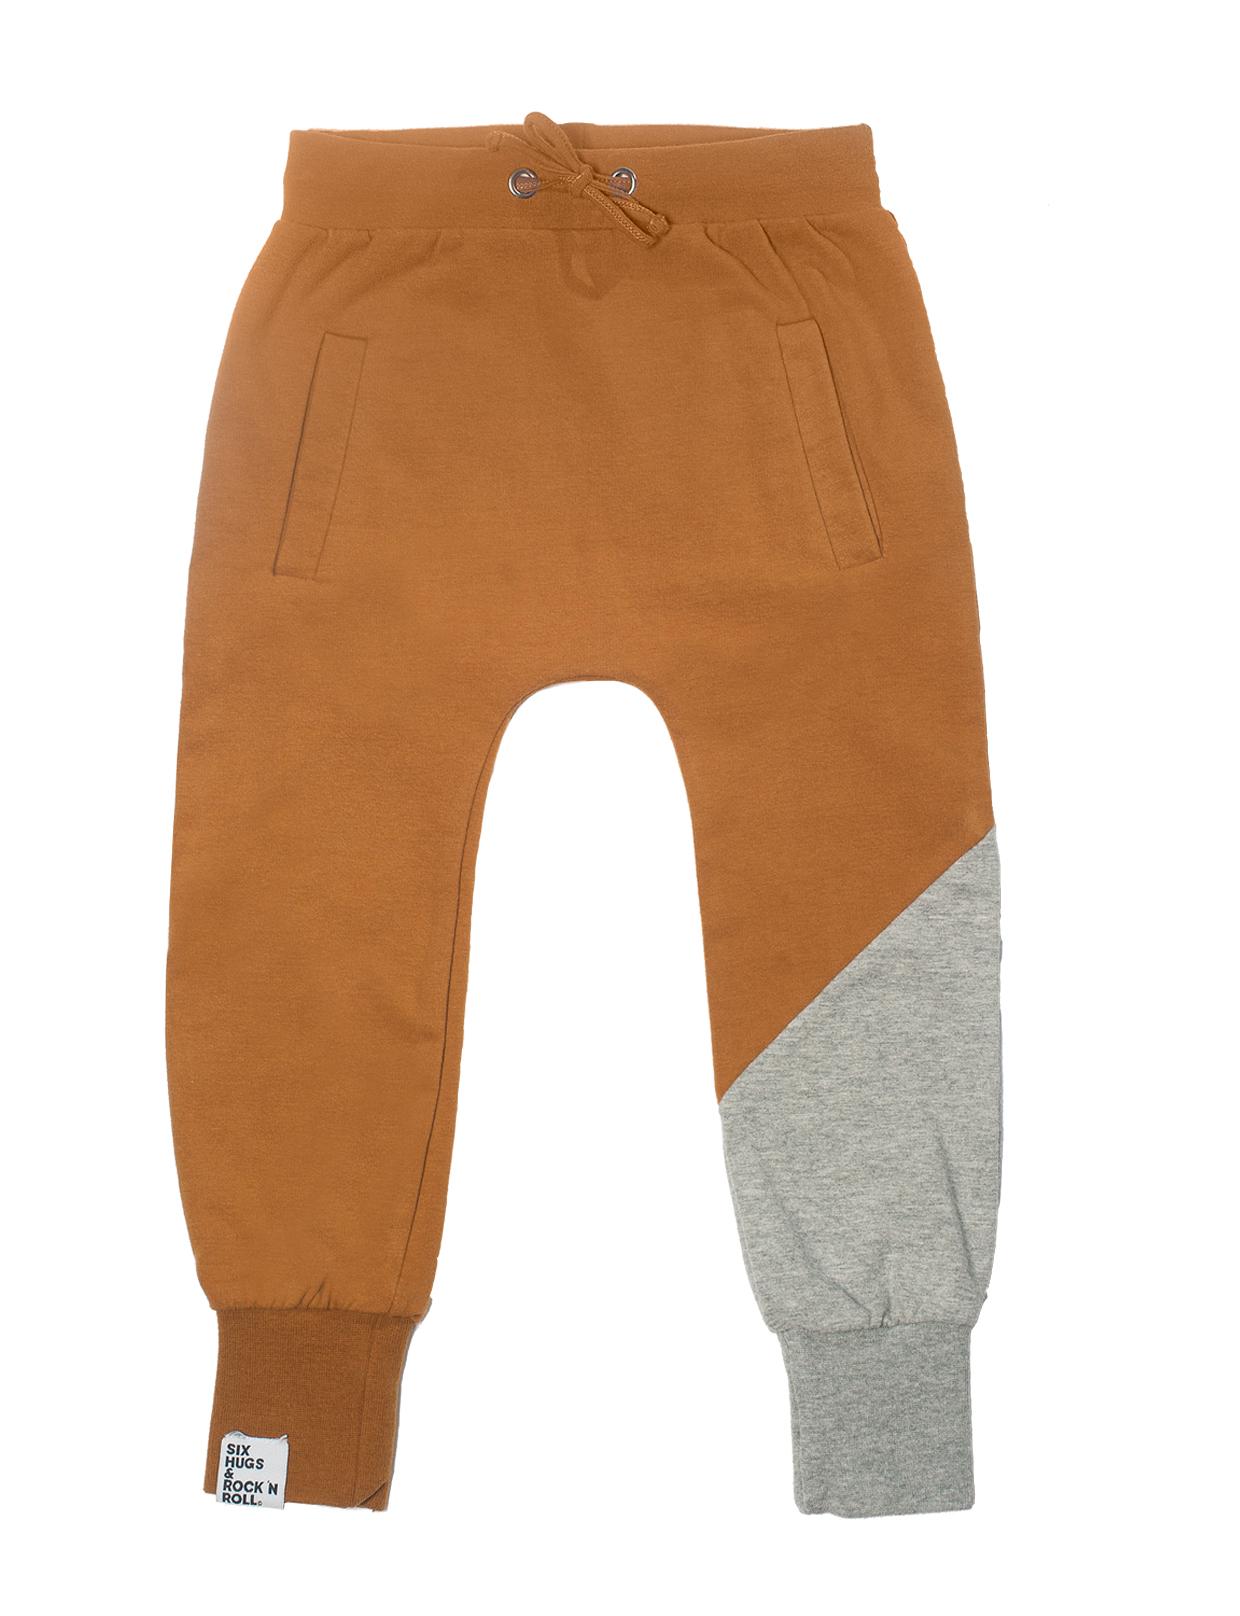 SHARR_SS15_sweatpants_browngrey_38euro